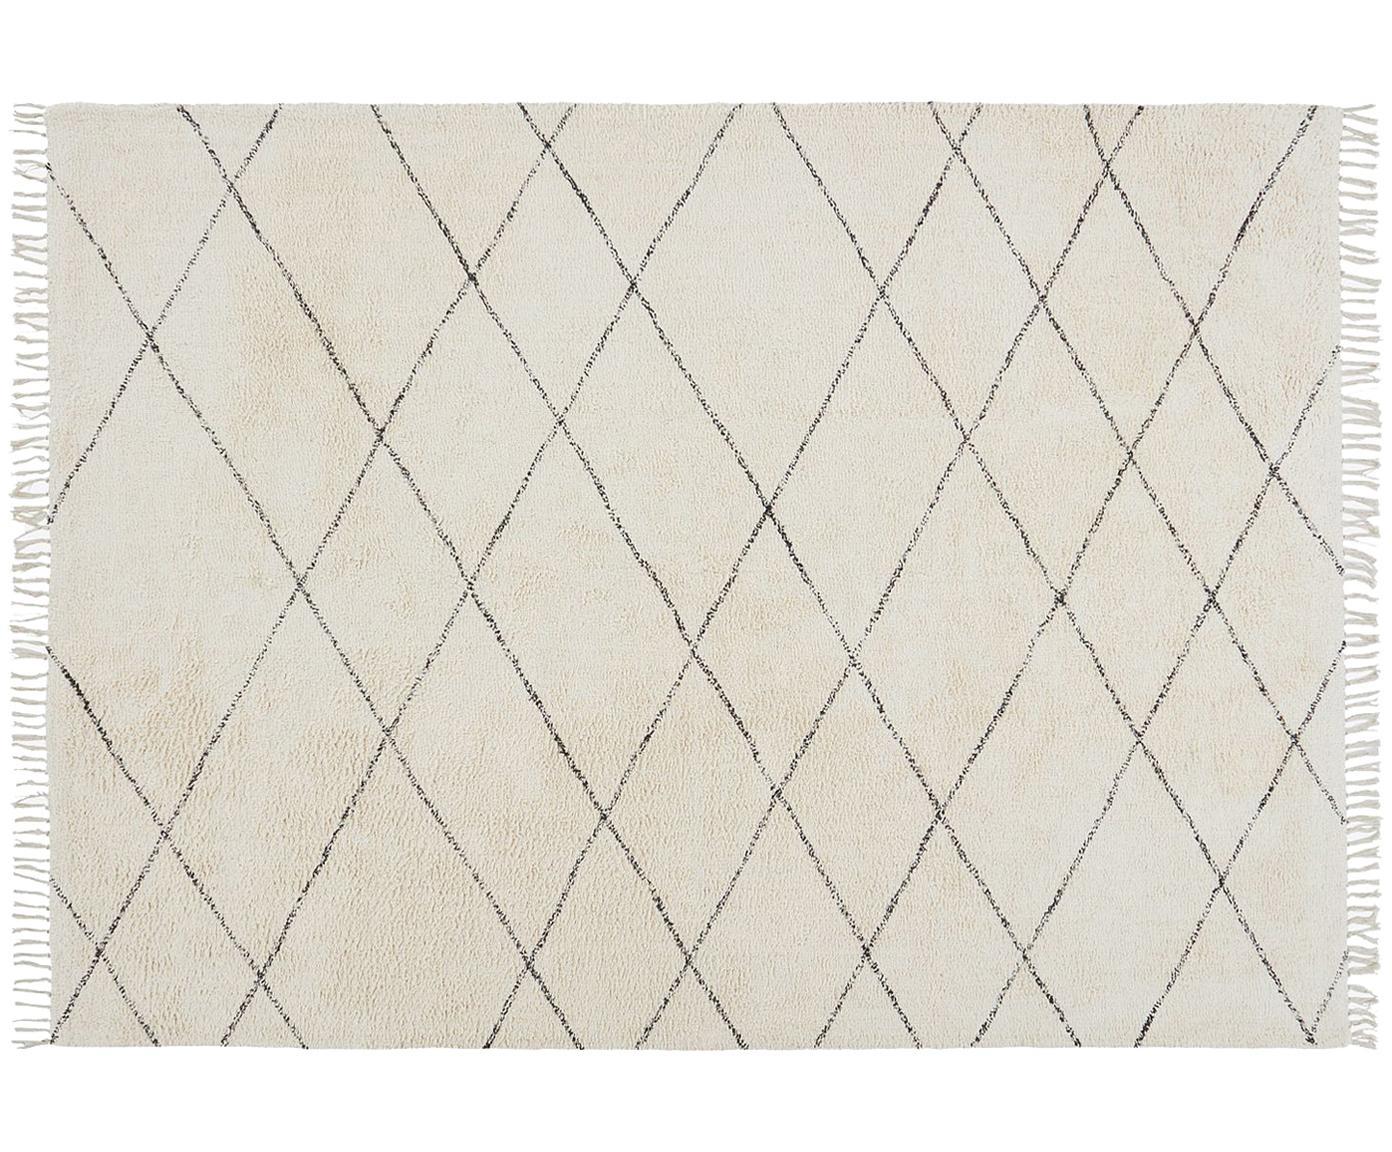 Alfombra de algodón Less, Algodón, Blanco crudo, negro, An 160 x L 230 cm (Tamaño M)